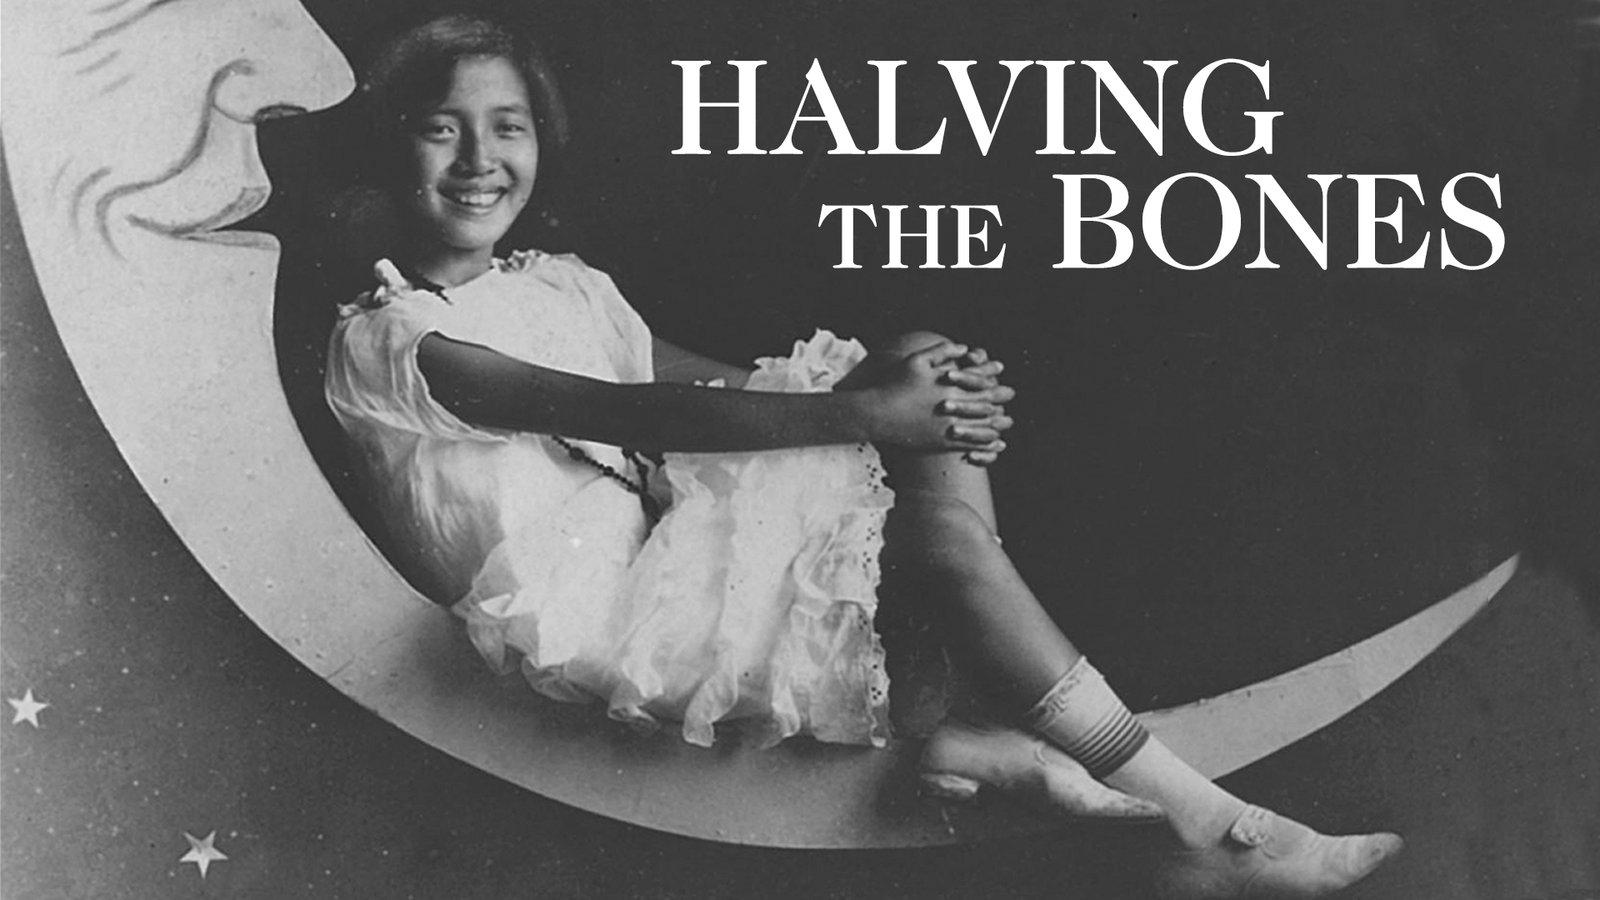 Halving the Bones - Author Ruth Ozeki's Autobiographical Film